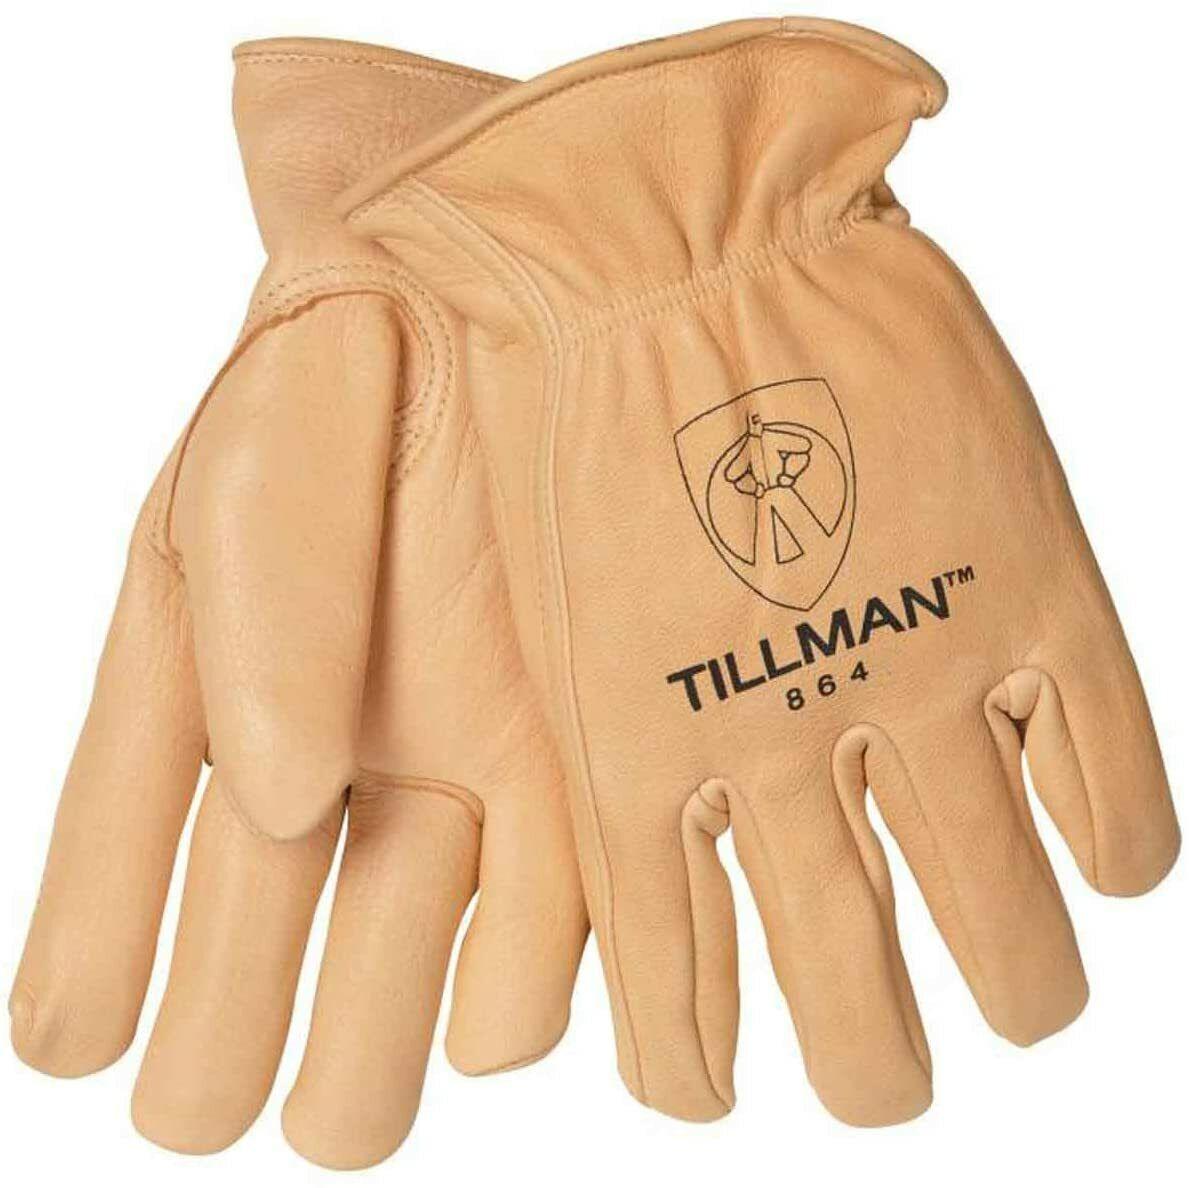 Tillman 864 Premium Unlined Top Grain Deerskin Drivers Gloves Various Sizes Business & Industrial